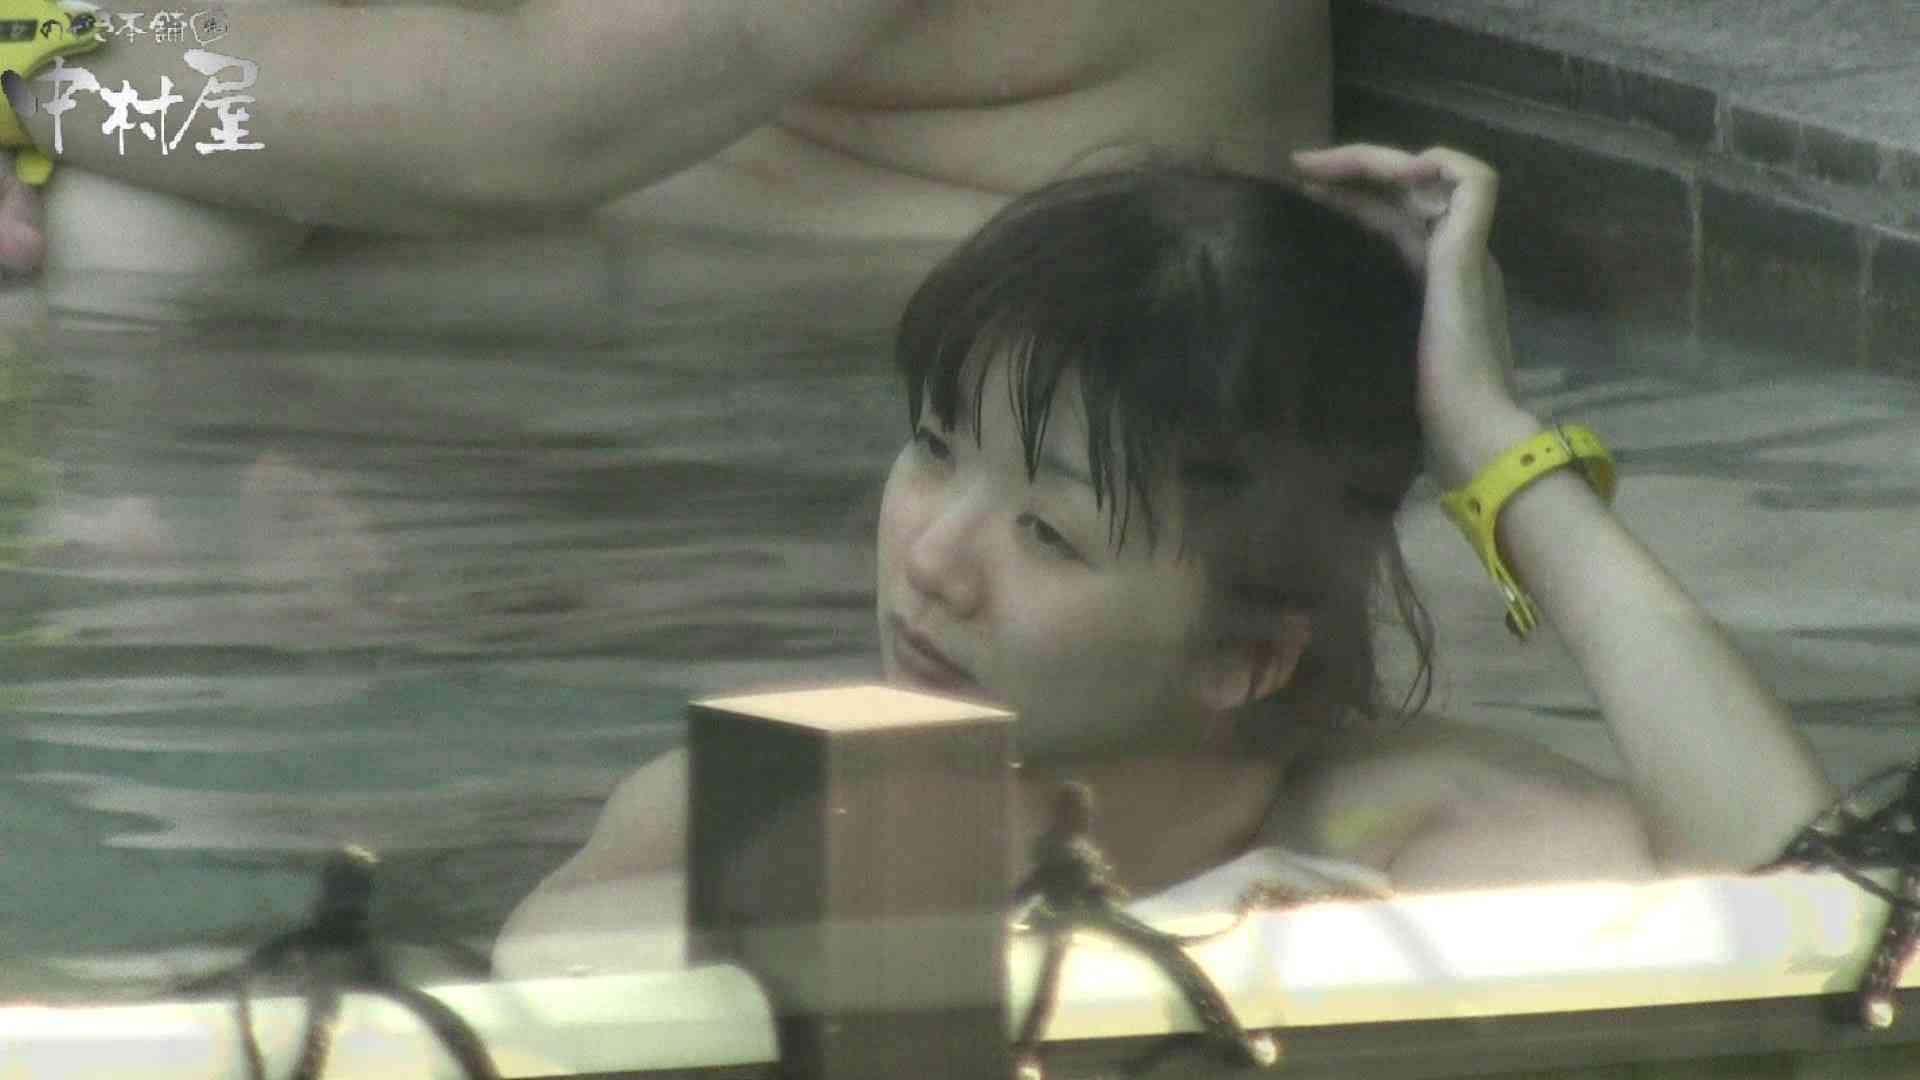 Aquaな露天風呂Vol.904 美しいOLの裸体 オメコ動画キャプチャ 103pic 35